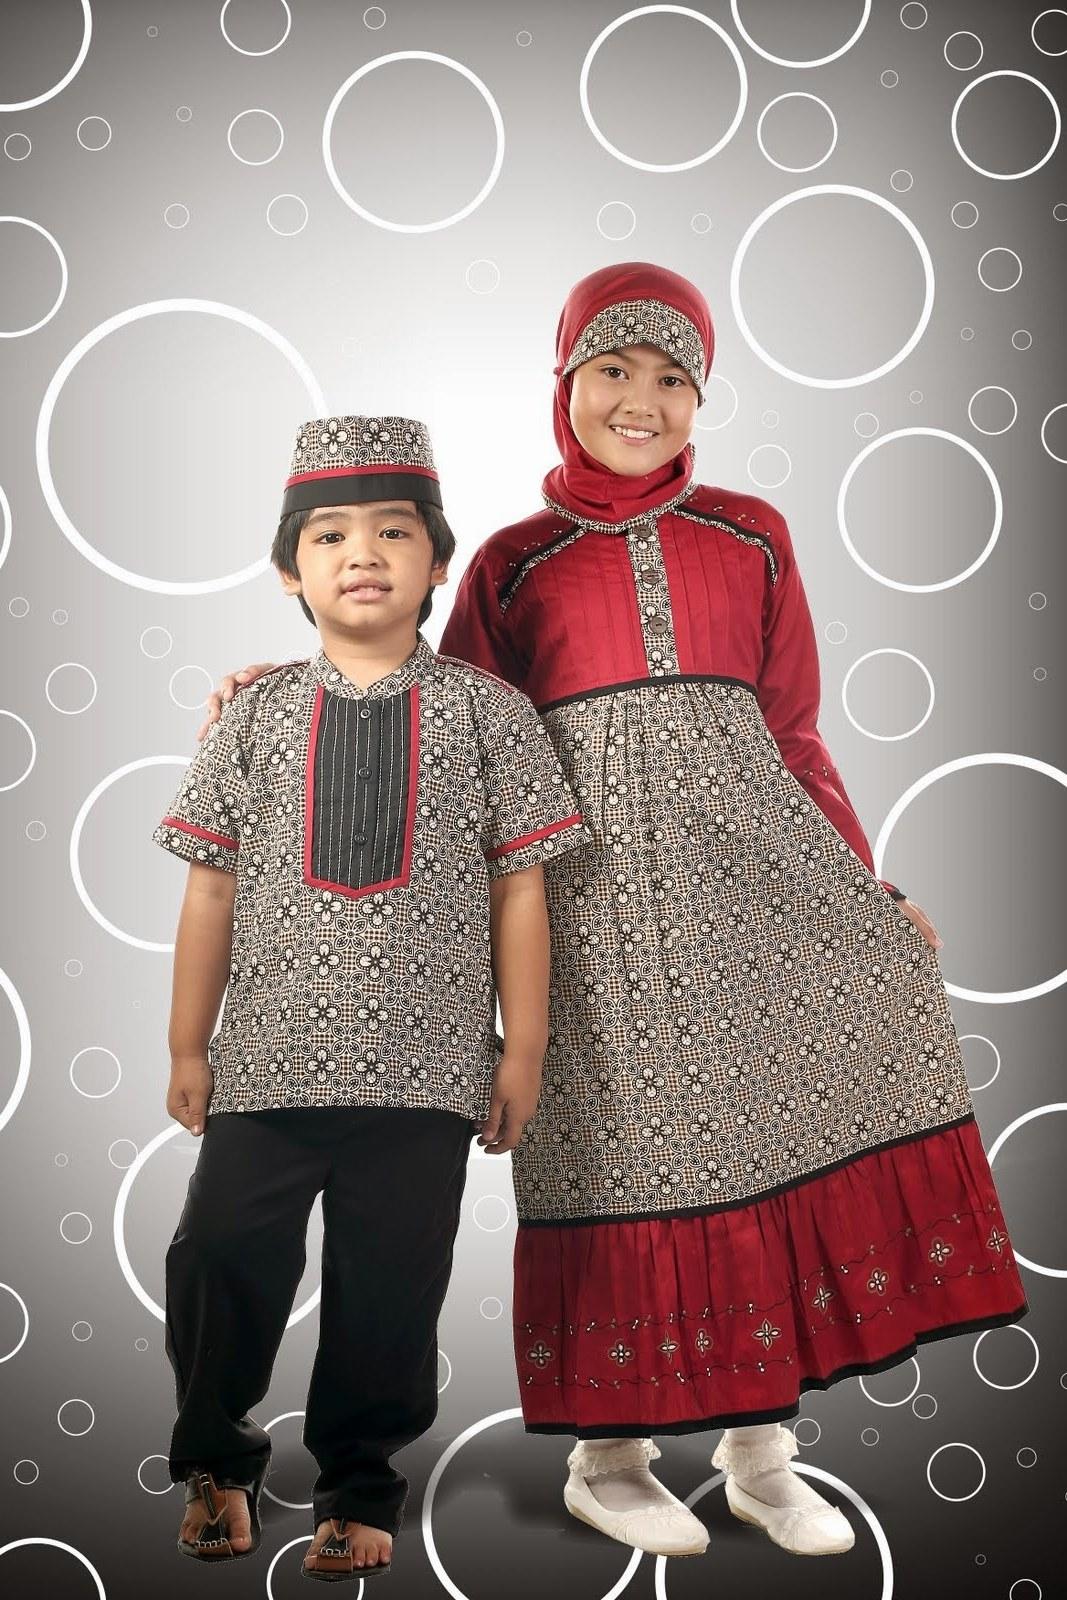 Inspirasi Baju Lebaran Anak Perempuan Terbaru Kvdd Model Baju Batik Muslim Terbaru Untuk Anak Perempuan Dan